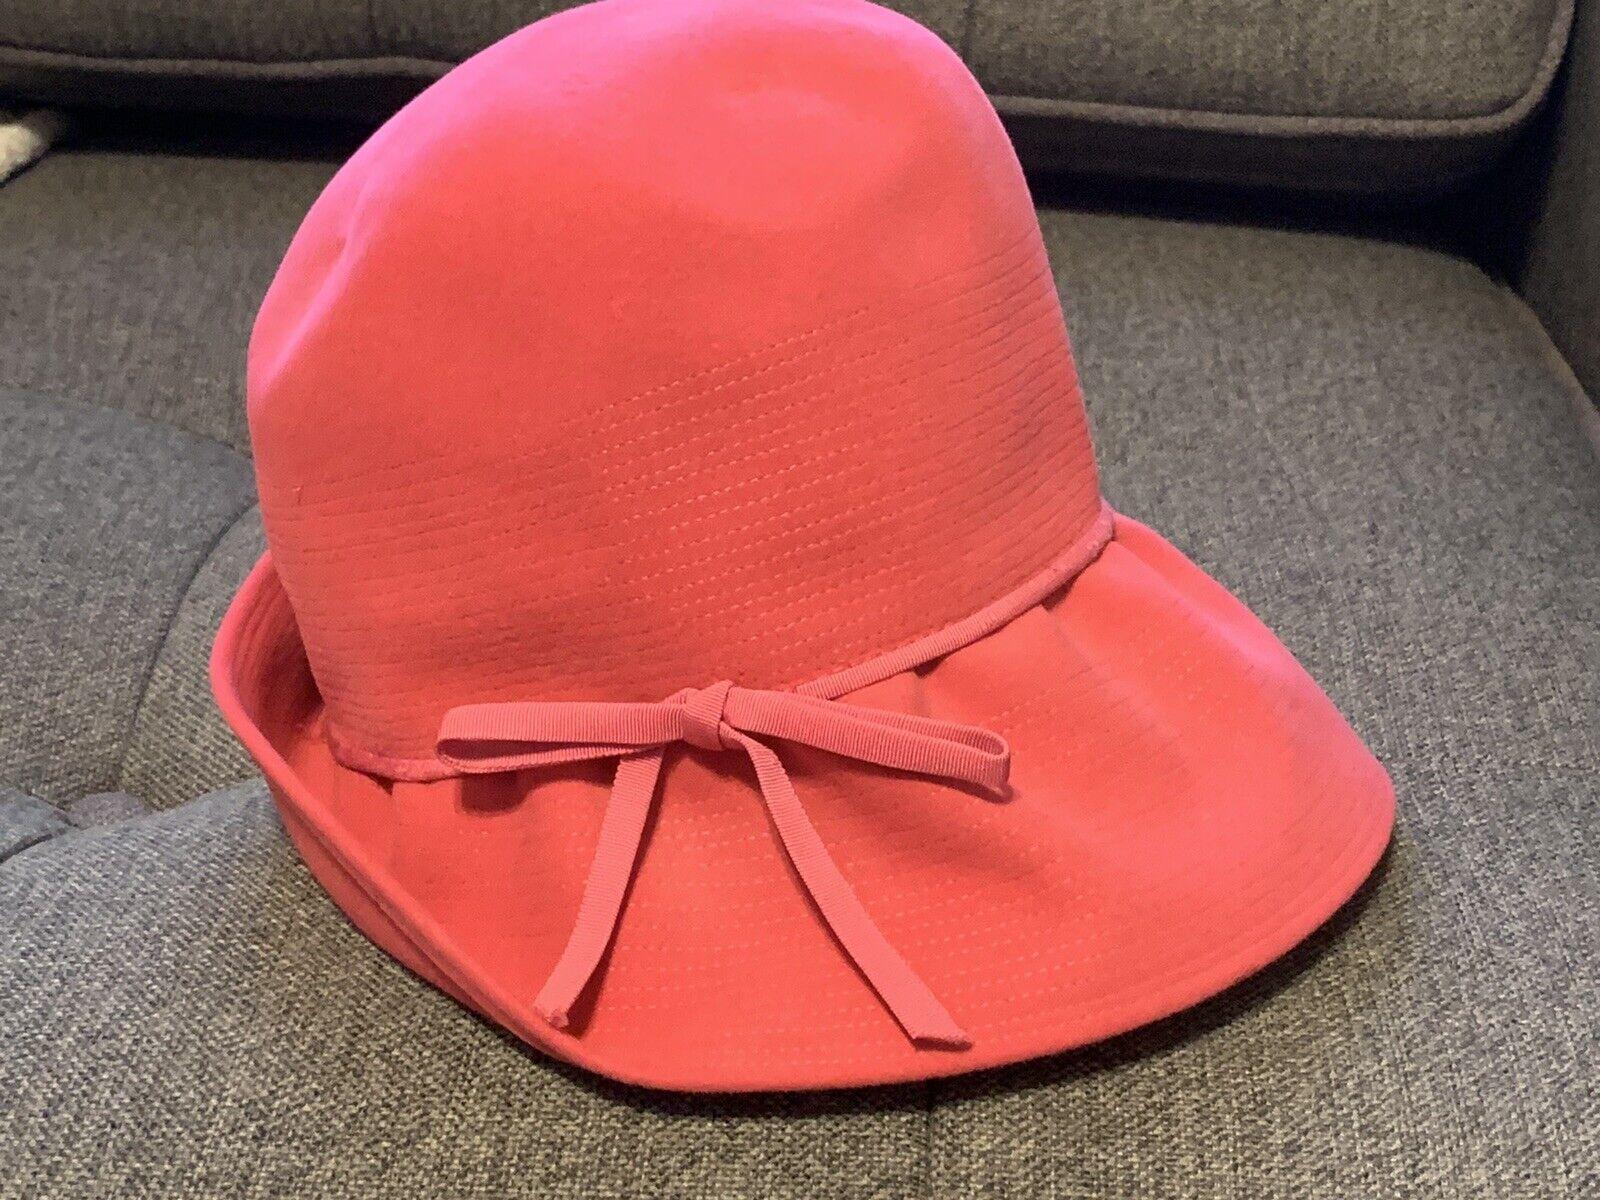 CHRISTIAN DIOR VINTAGE PINK BUCKET STYLE HAT - image 1